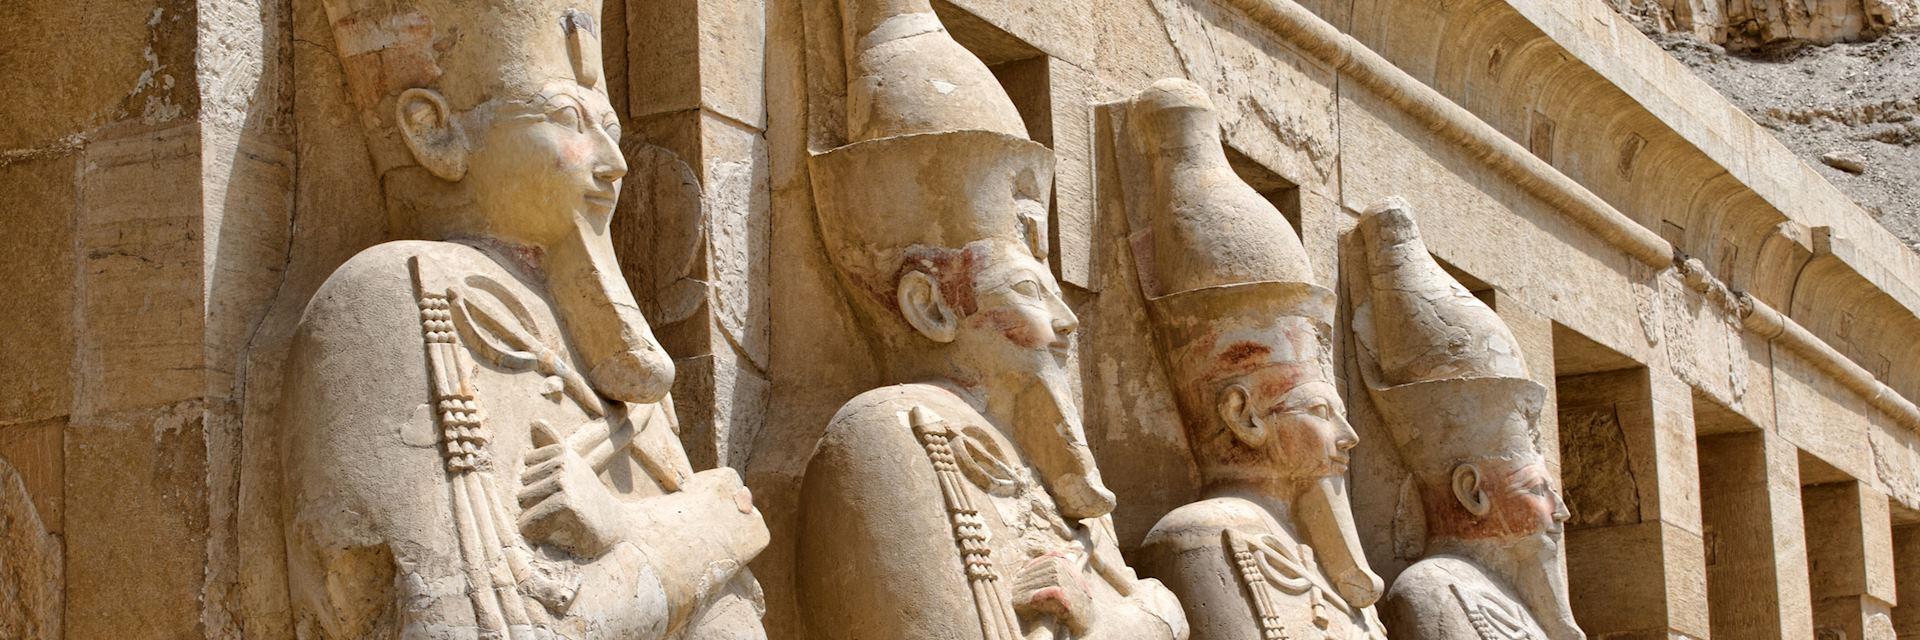 Statues near Luxor